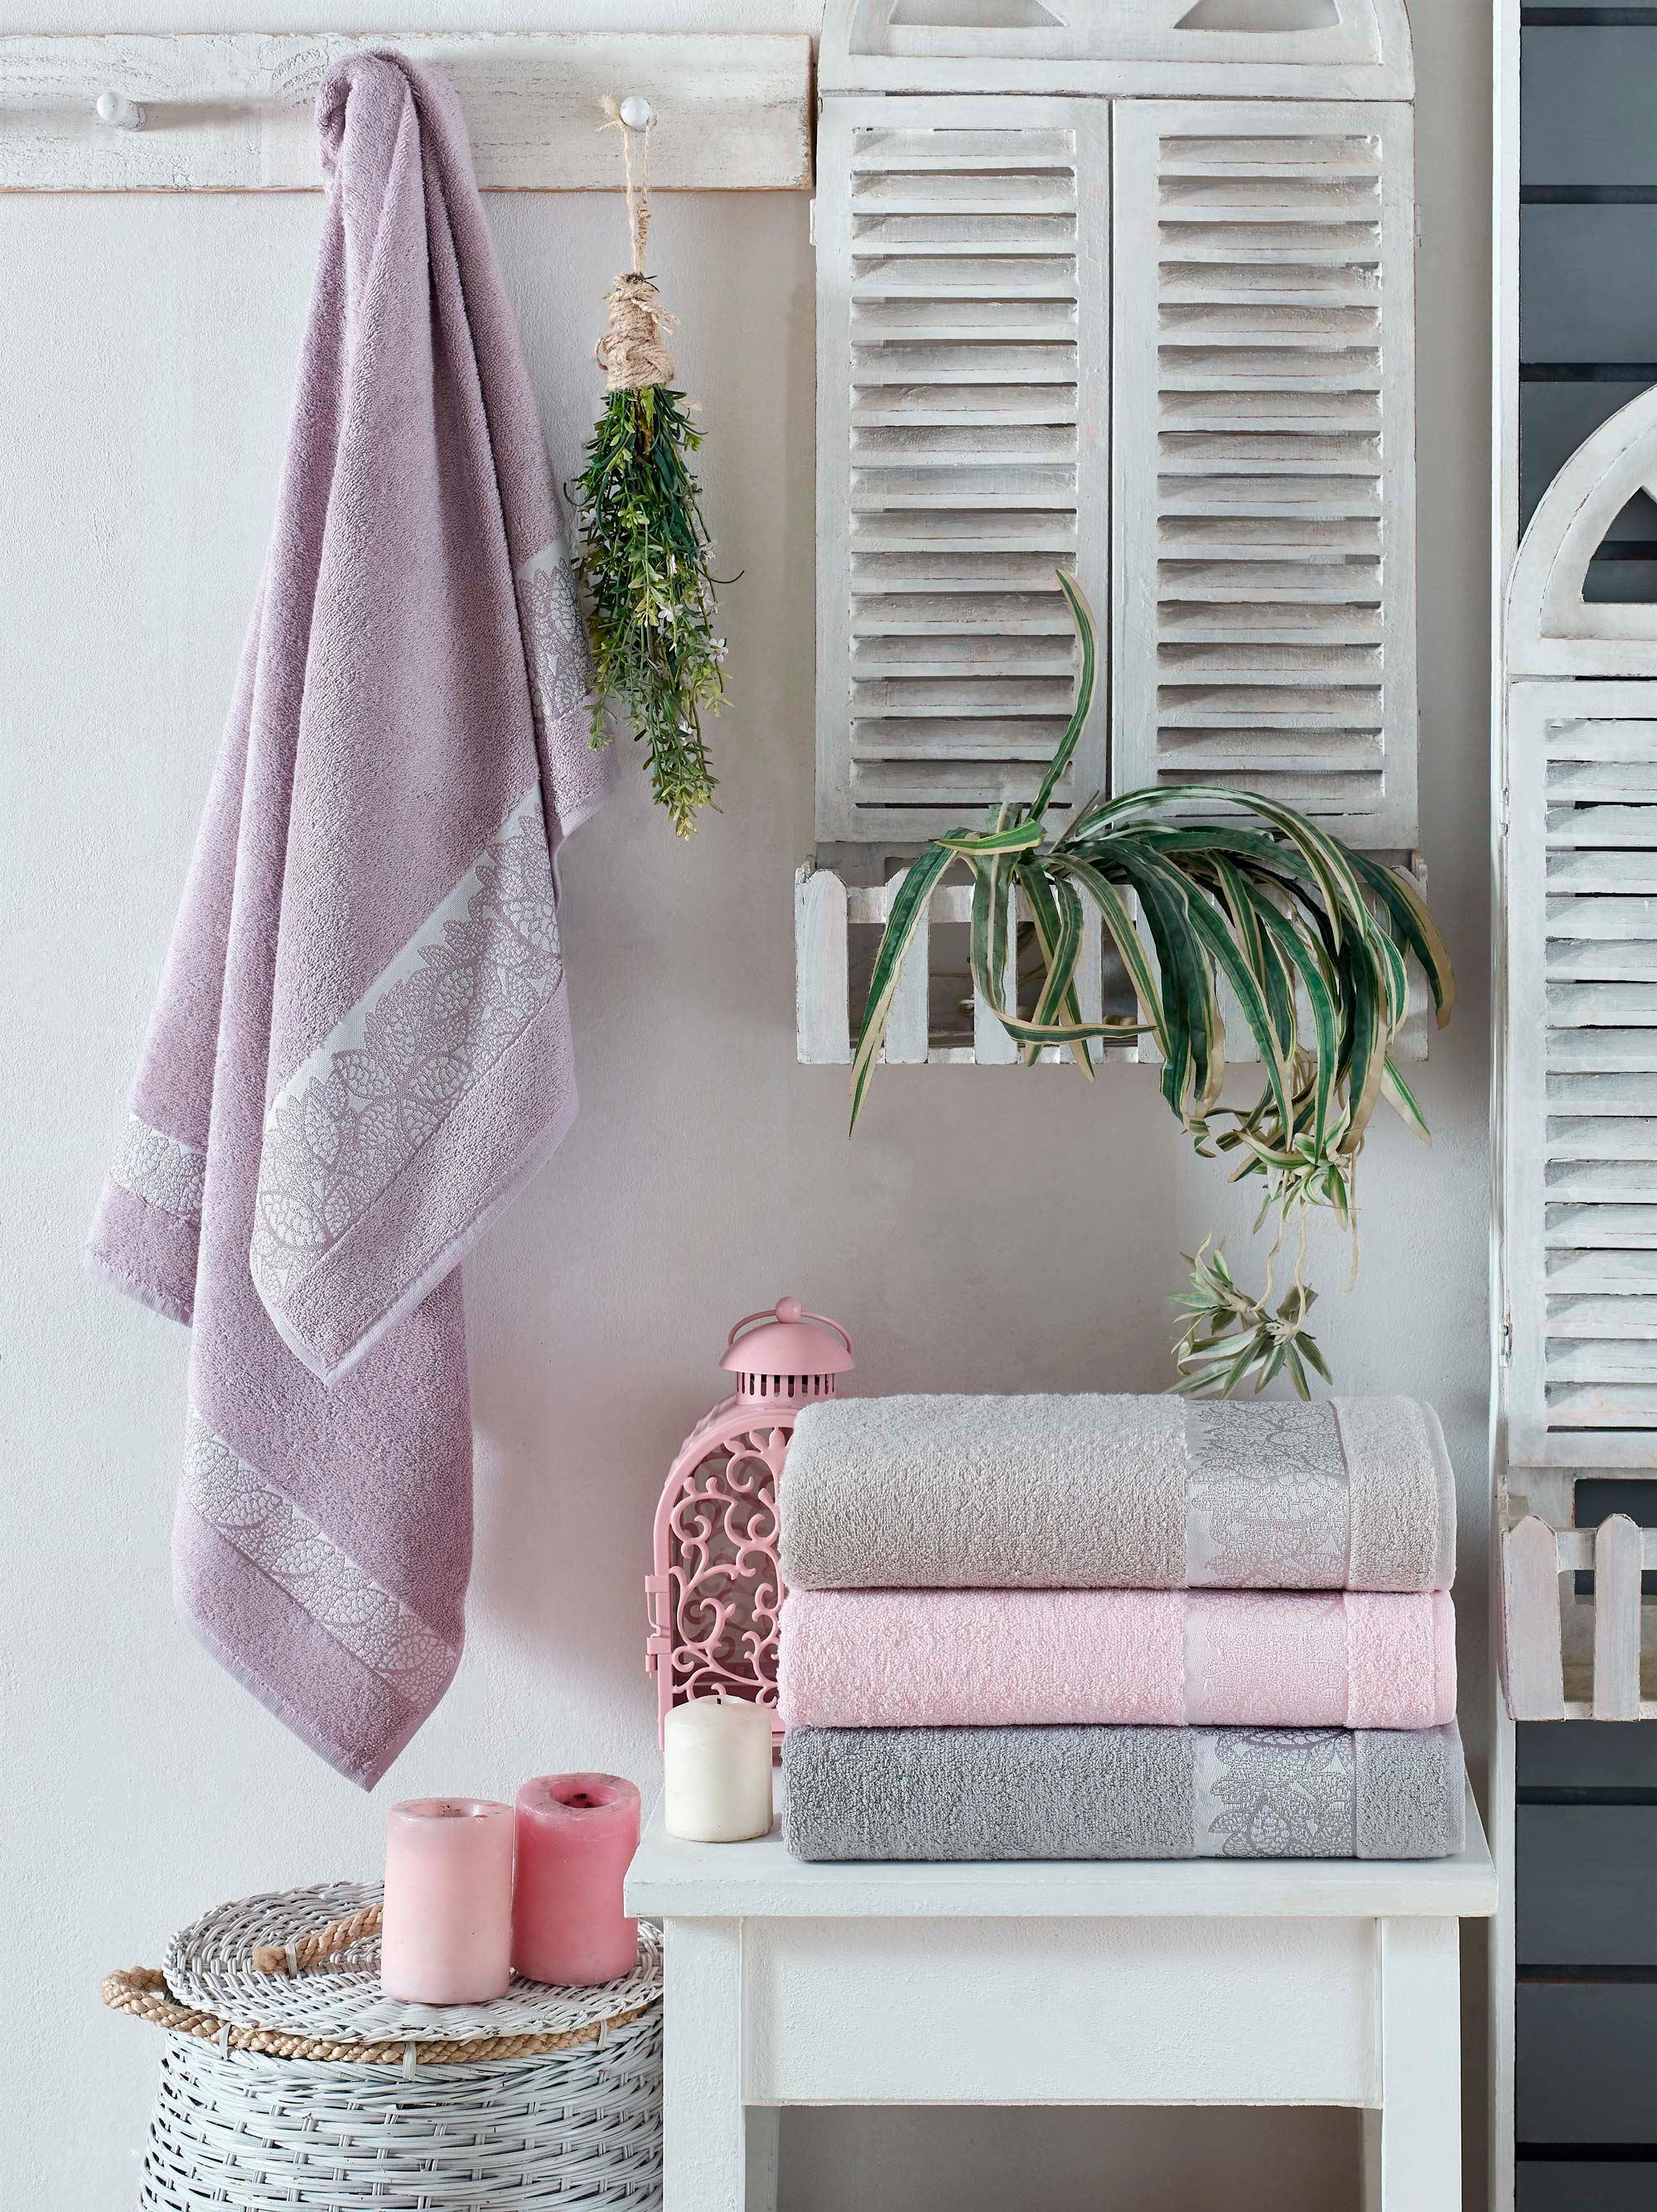 Купить Полотенца DO'n'CO, Полотенце Daisy (50х90 см - 4 шт), Турция, Розовый, Серый, Сиреневый, Бамбук